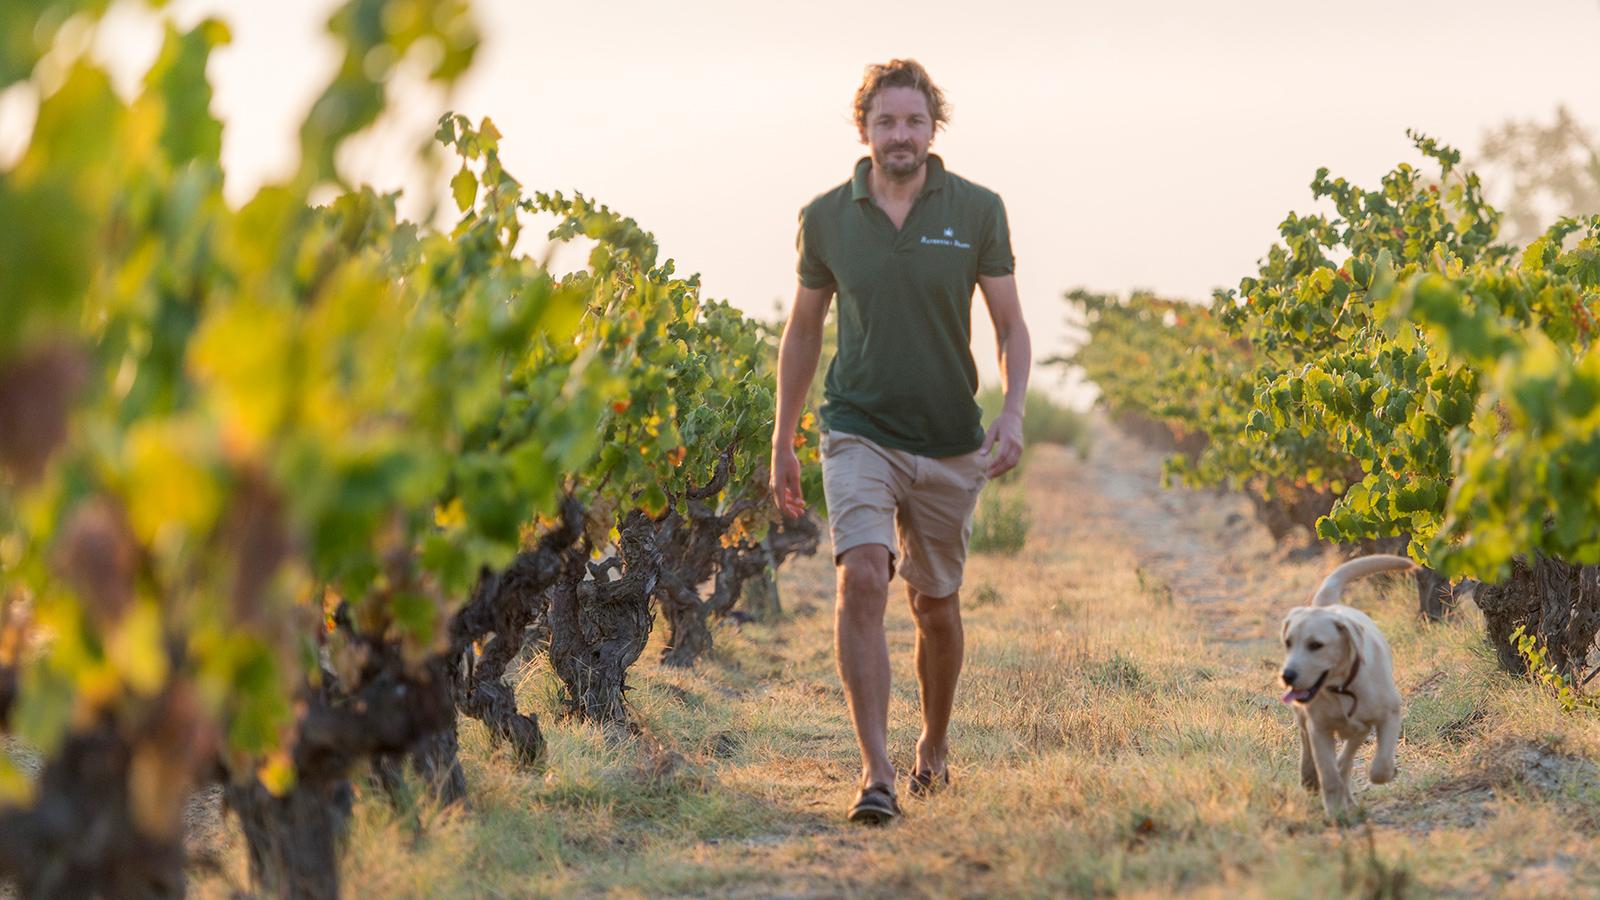 Wine Refrigerator Reviews Wine Spectator 15 sparkling wines for everyday enjoyment | tasting highlights